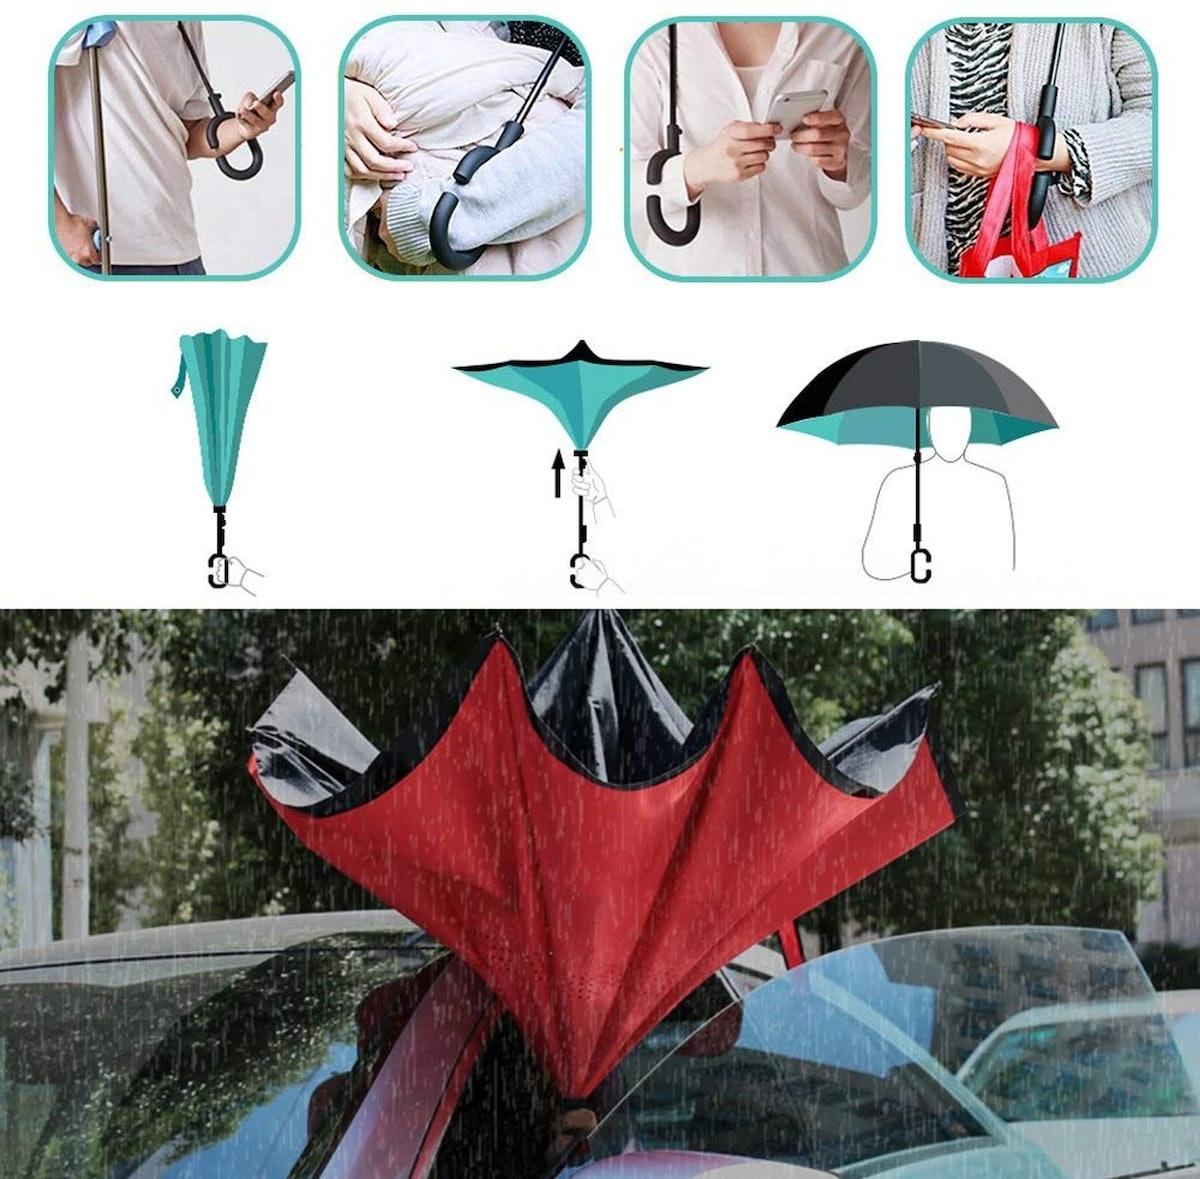 Owen Kyne Windproof Double Layer Folding Umbrella